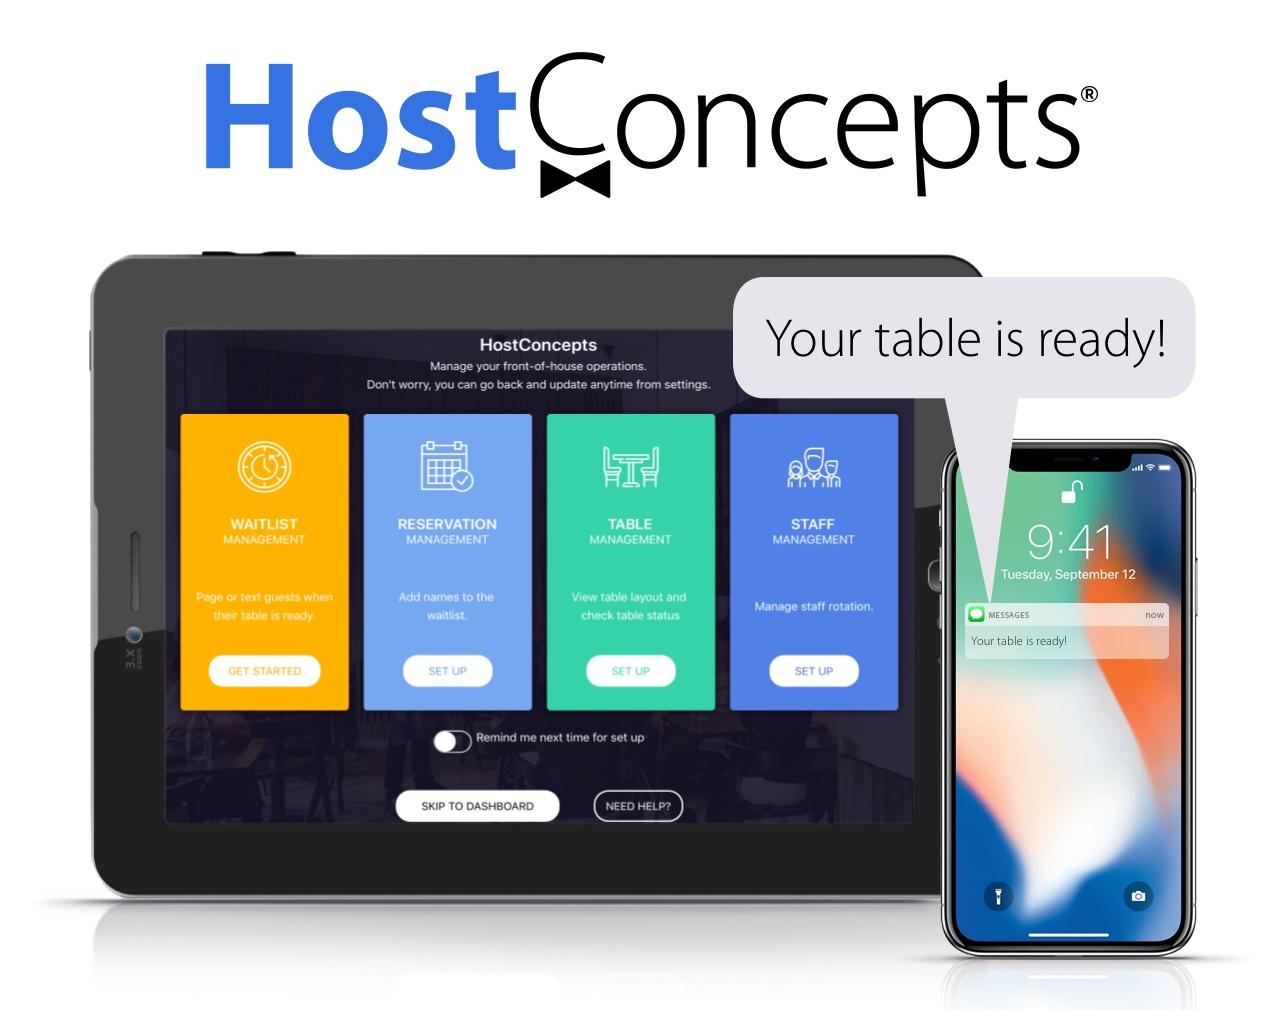 HostConcepts